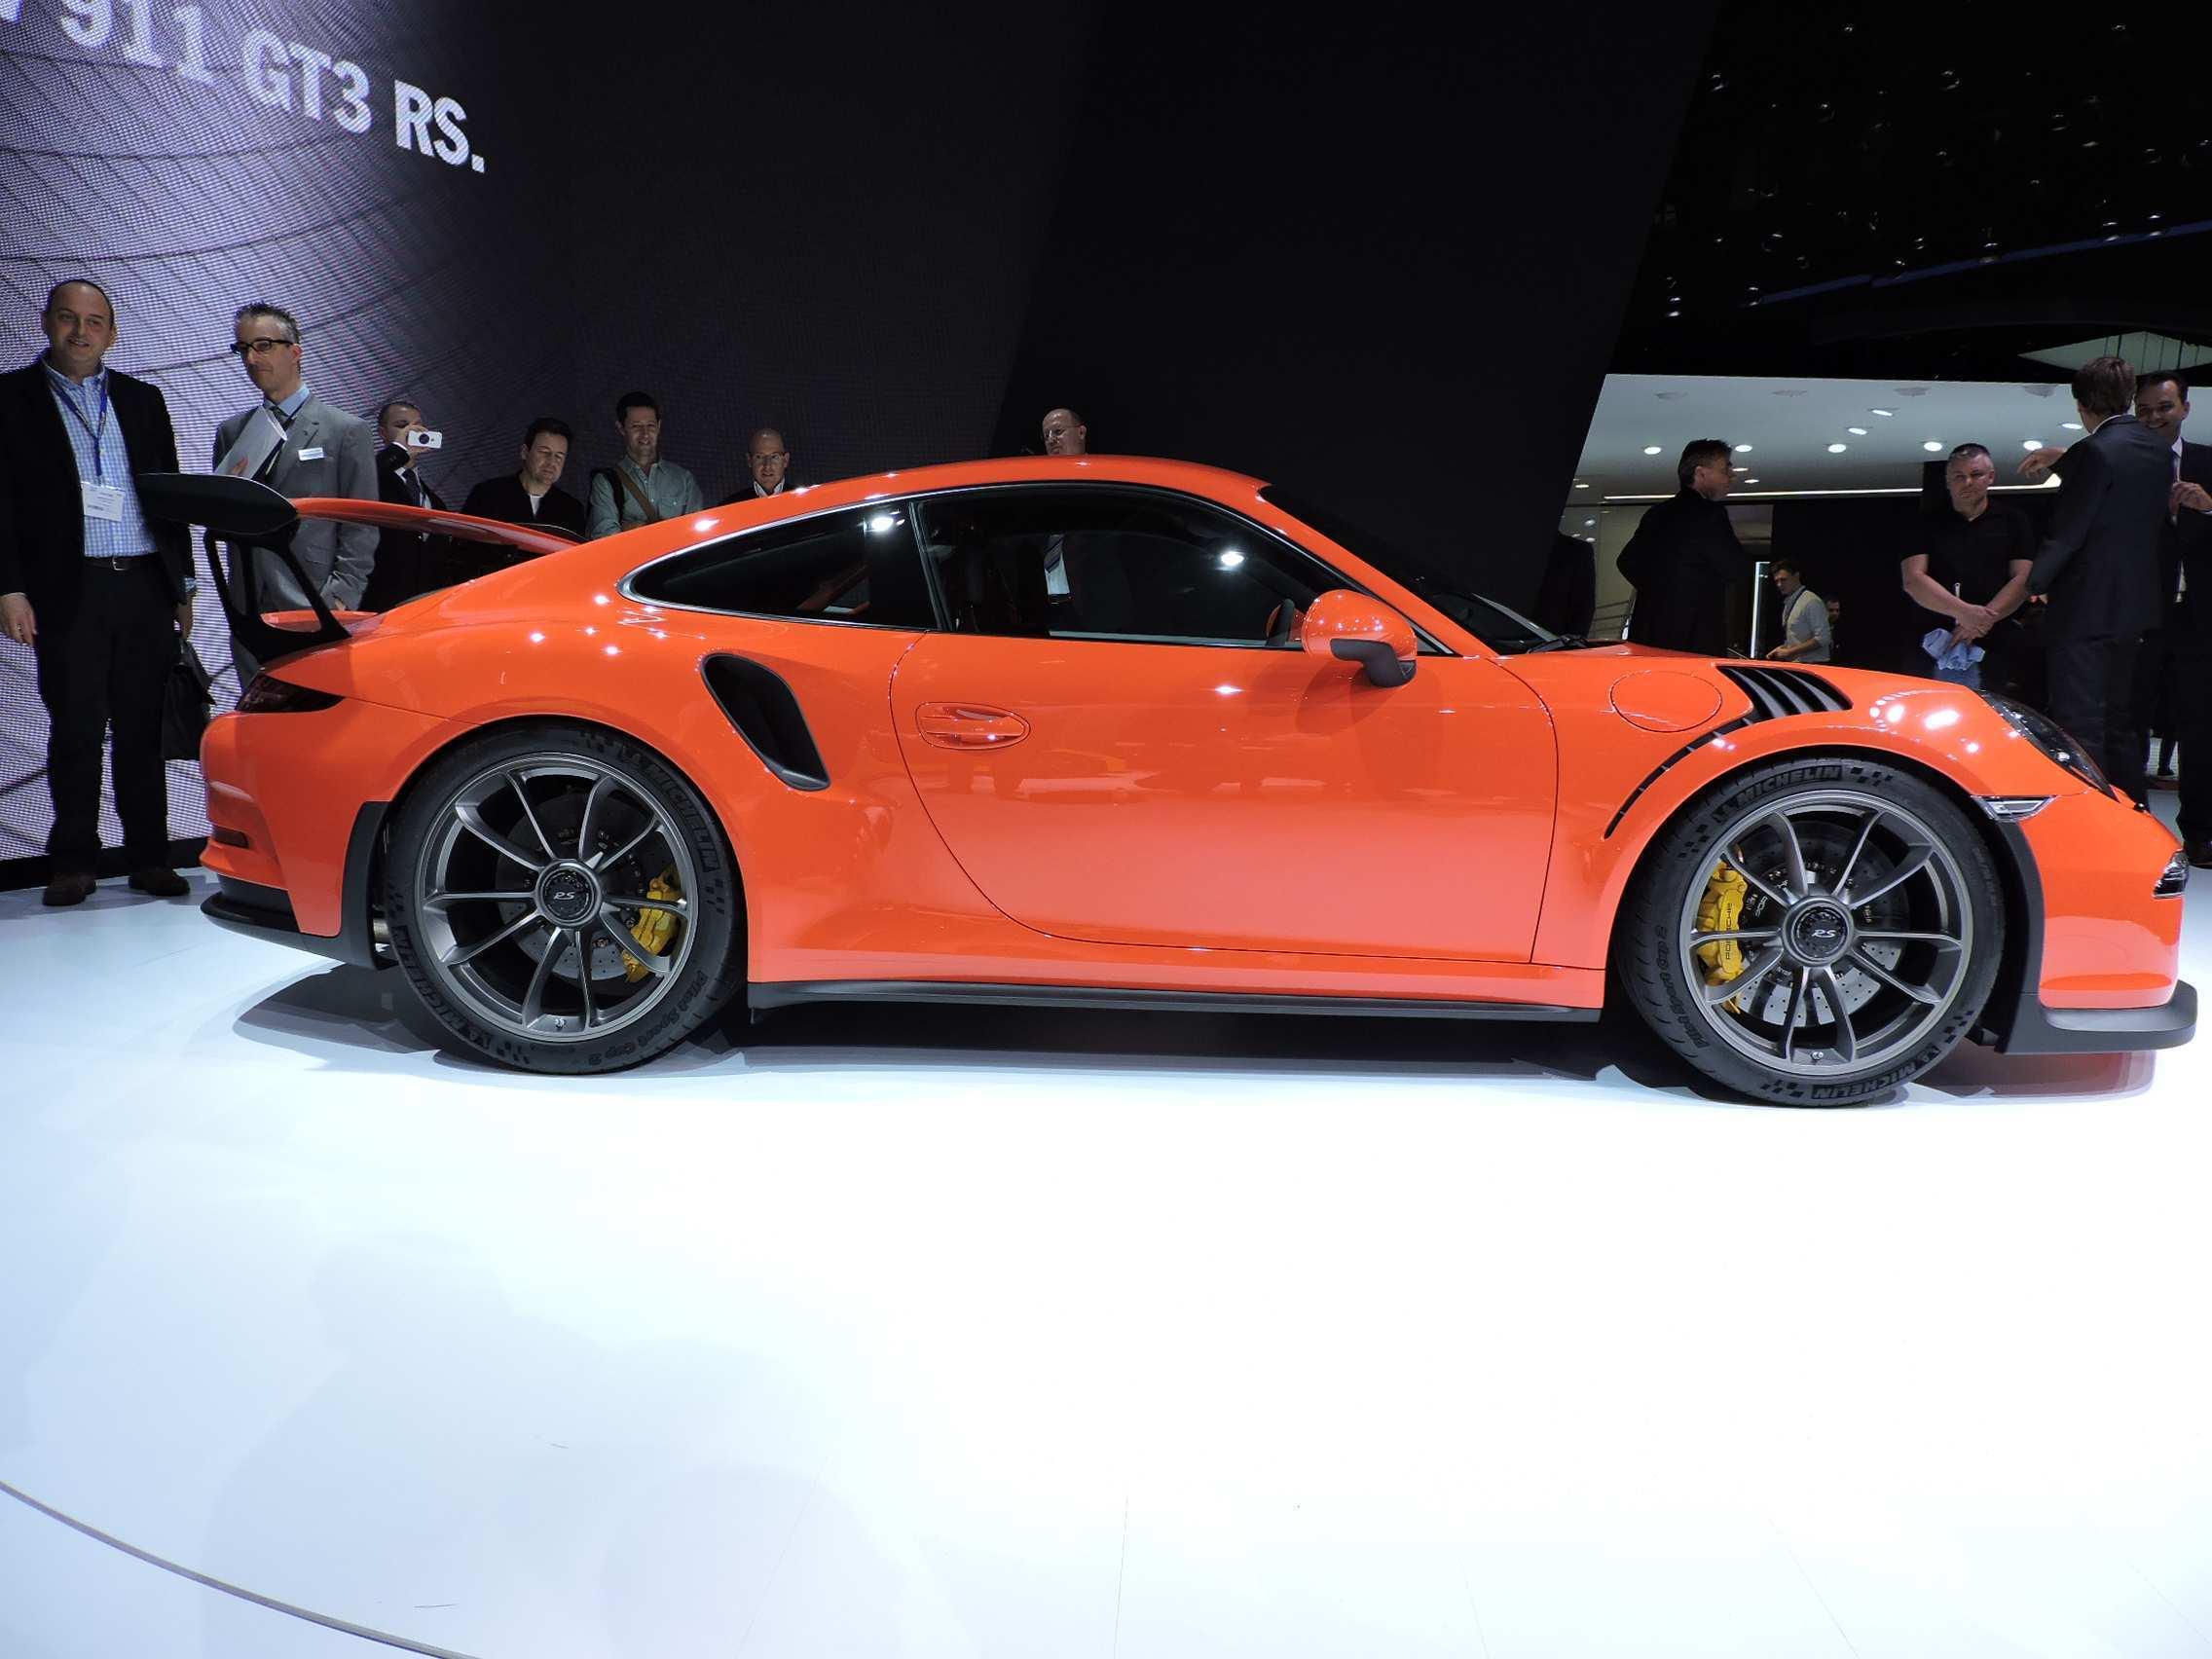 19 All New 2020 Porsche Gt3 Rs Release Date with 2020 Porsche Gt3 Rs